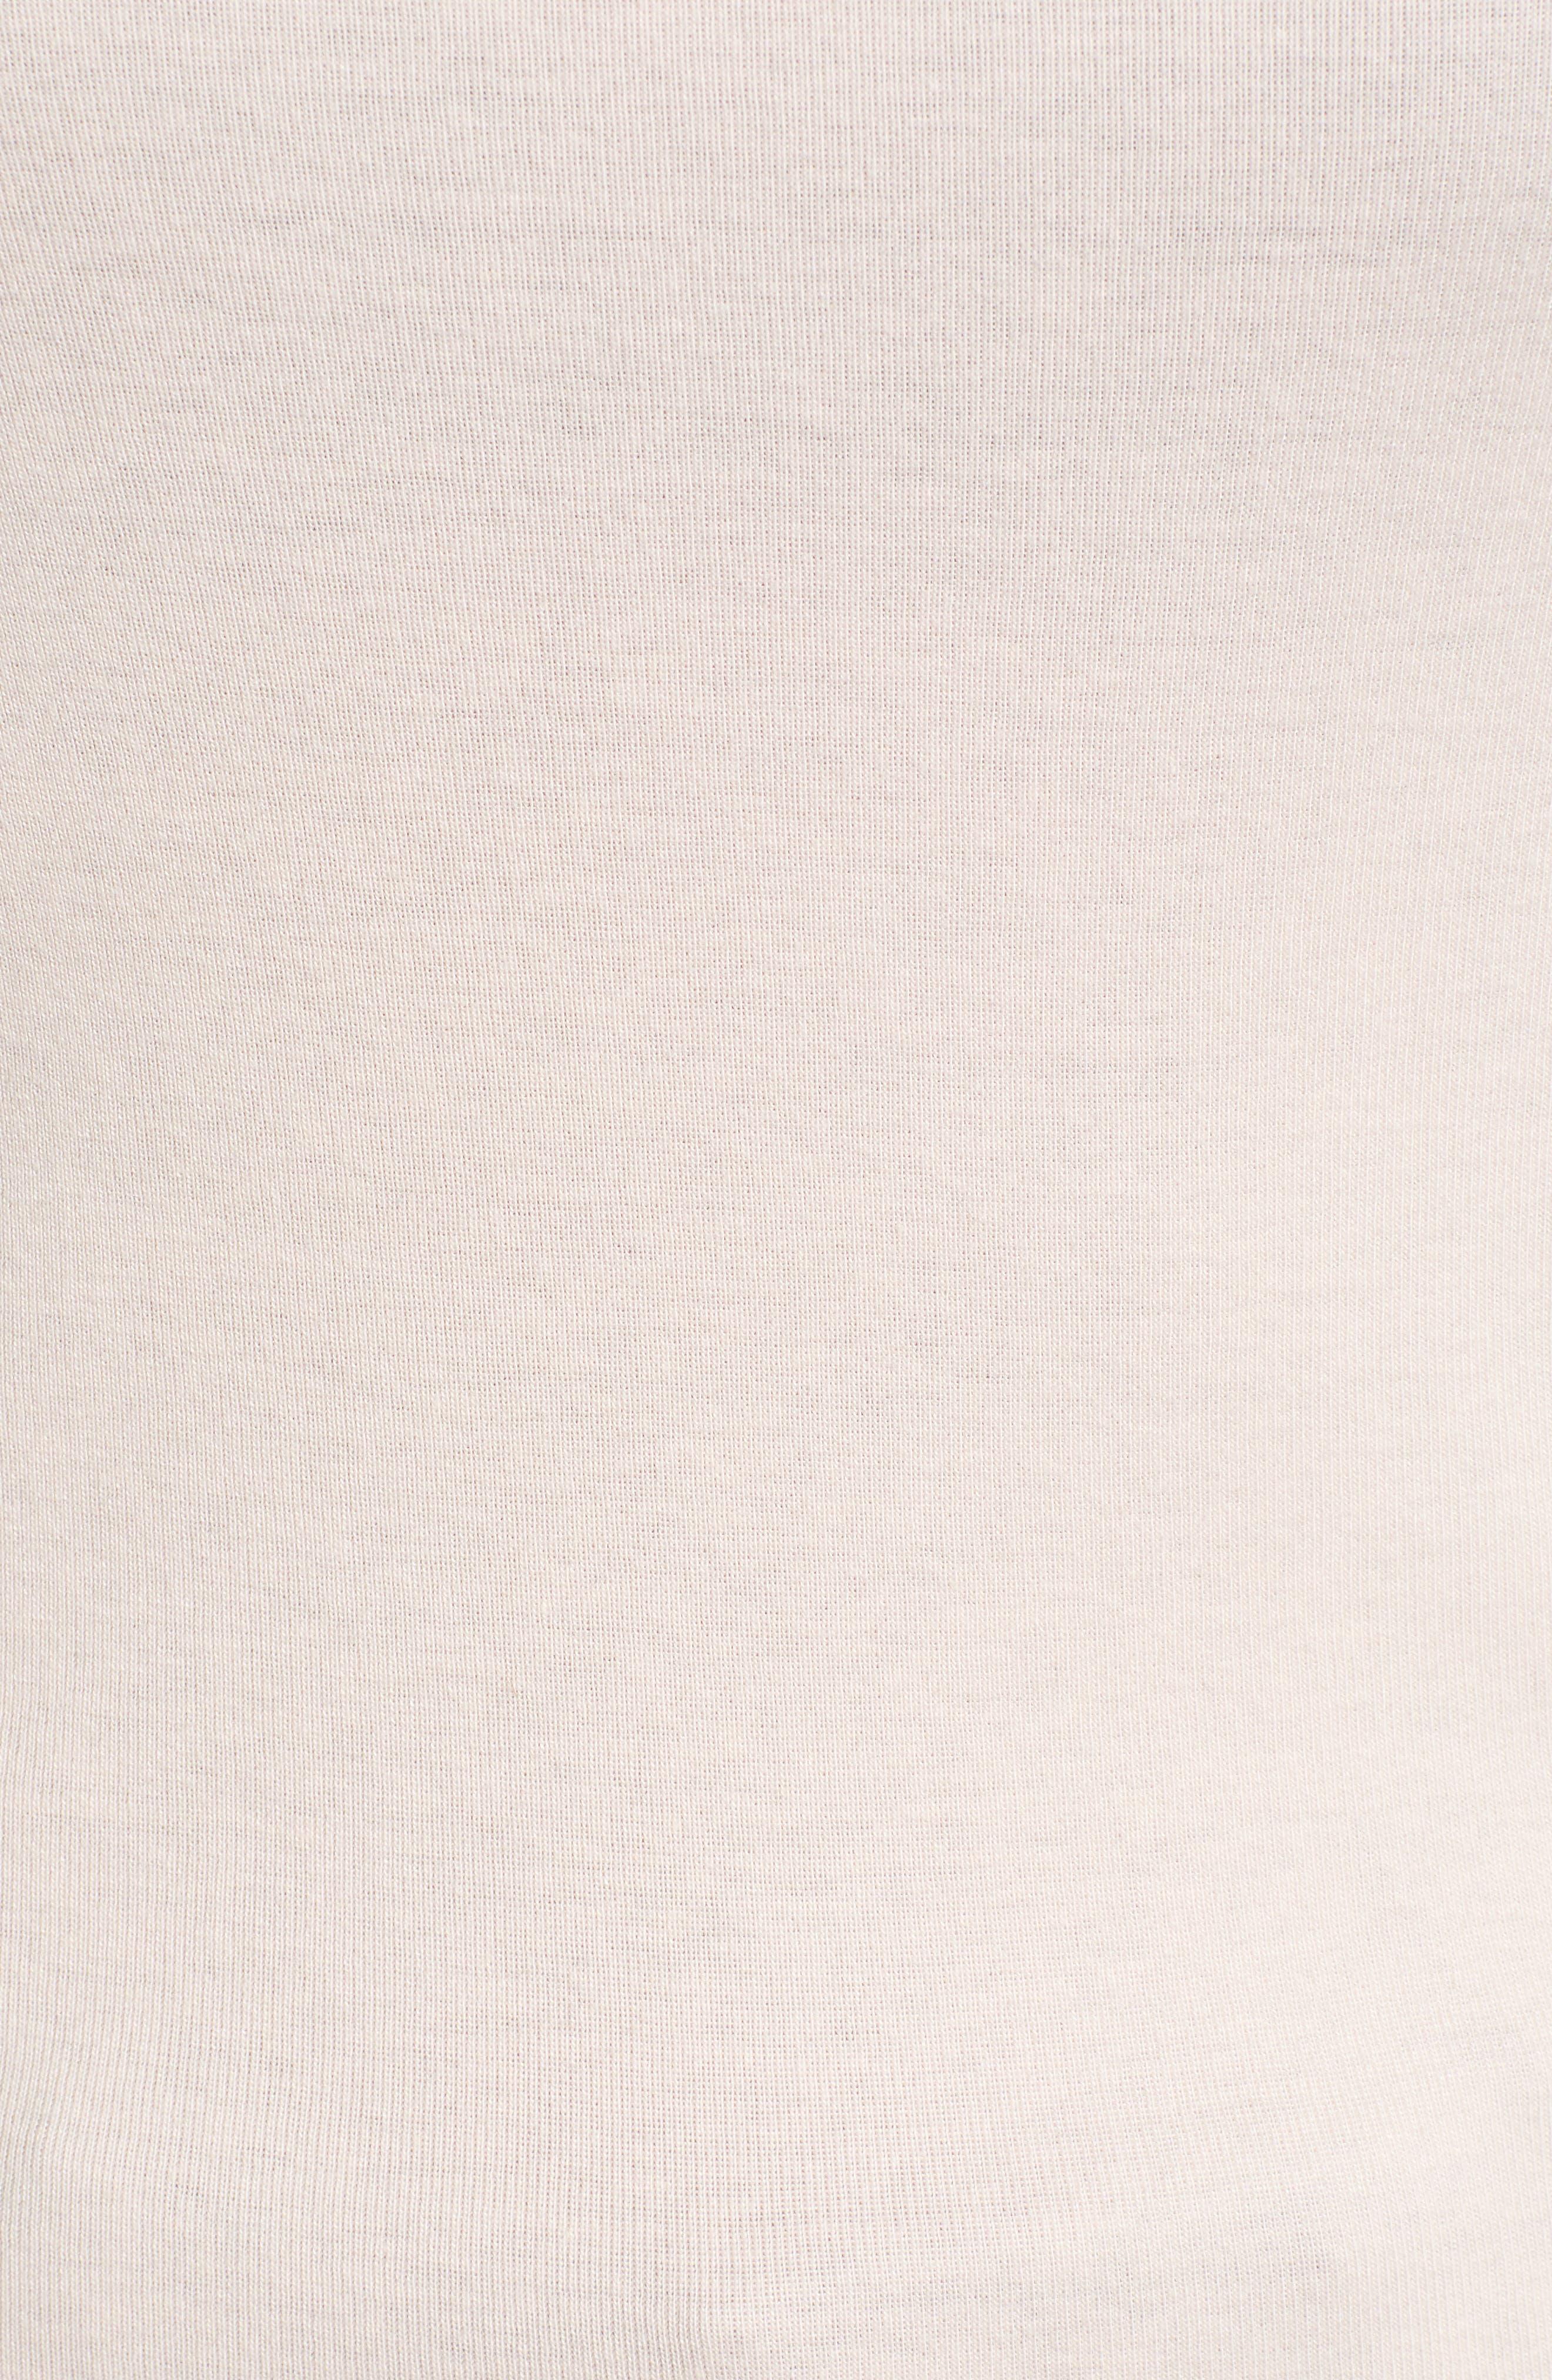 Three Quarter Sleeve Tee,                             Alternate thumbnail 6, color,                             PINK CHINTZ